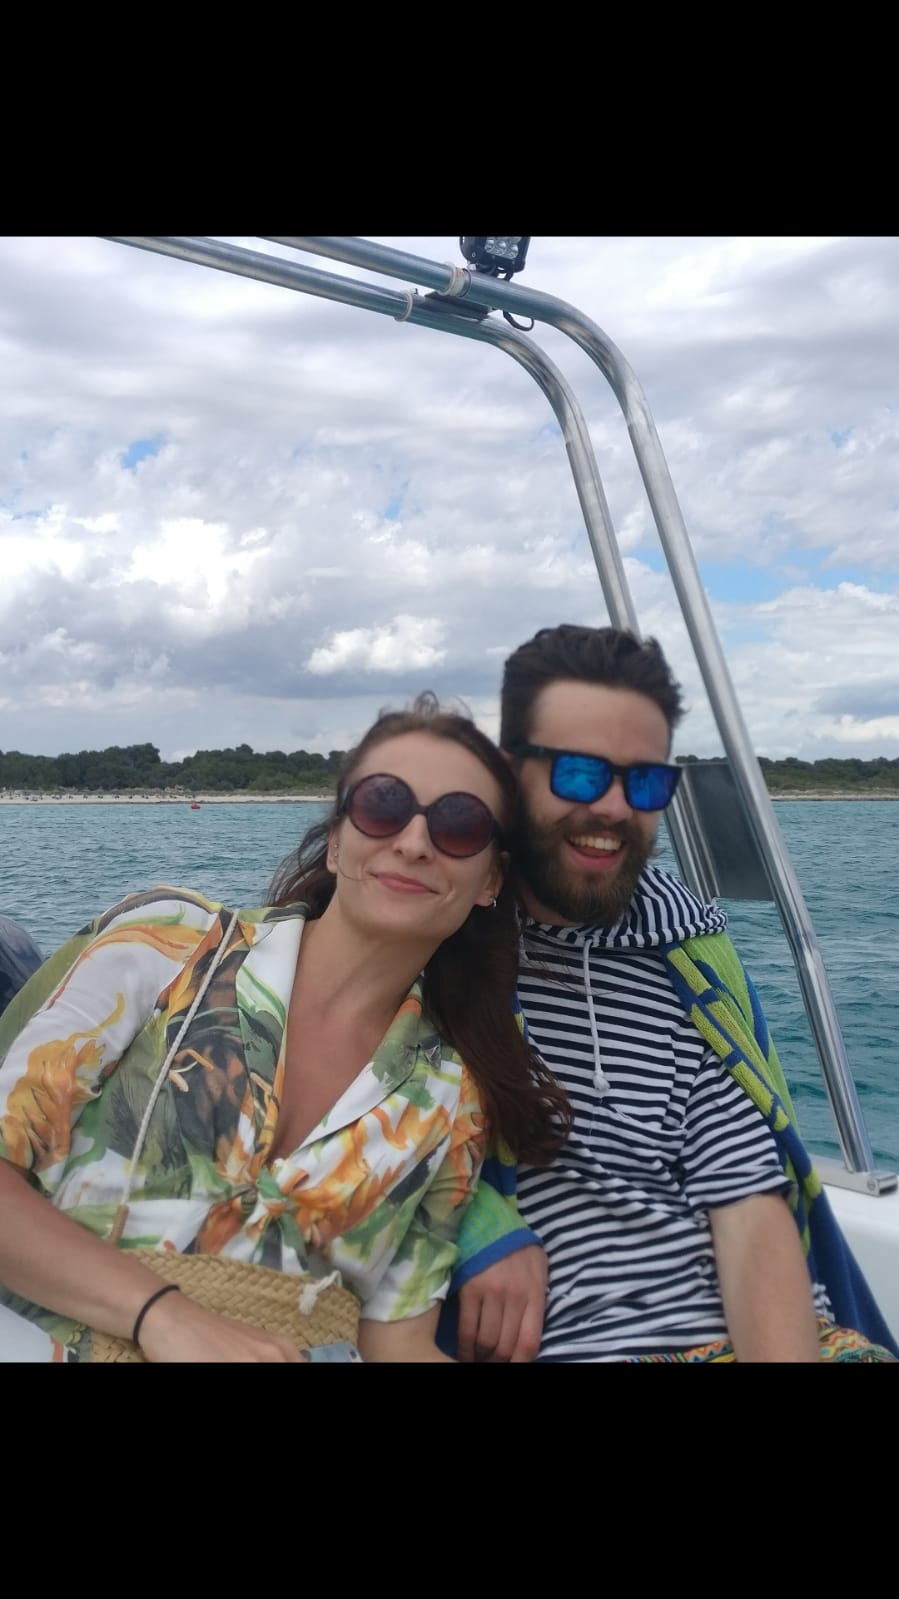 Tom & Silvie